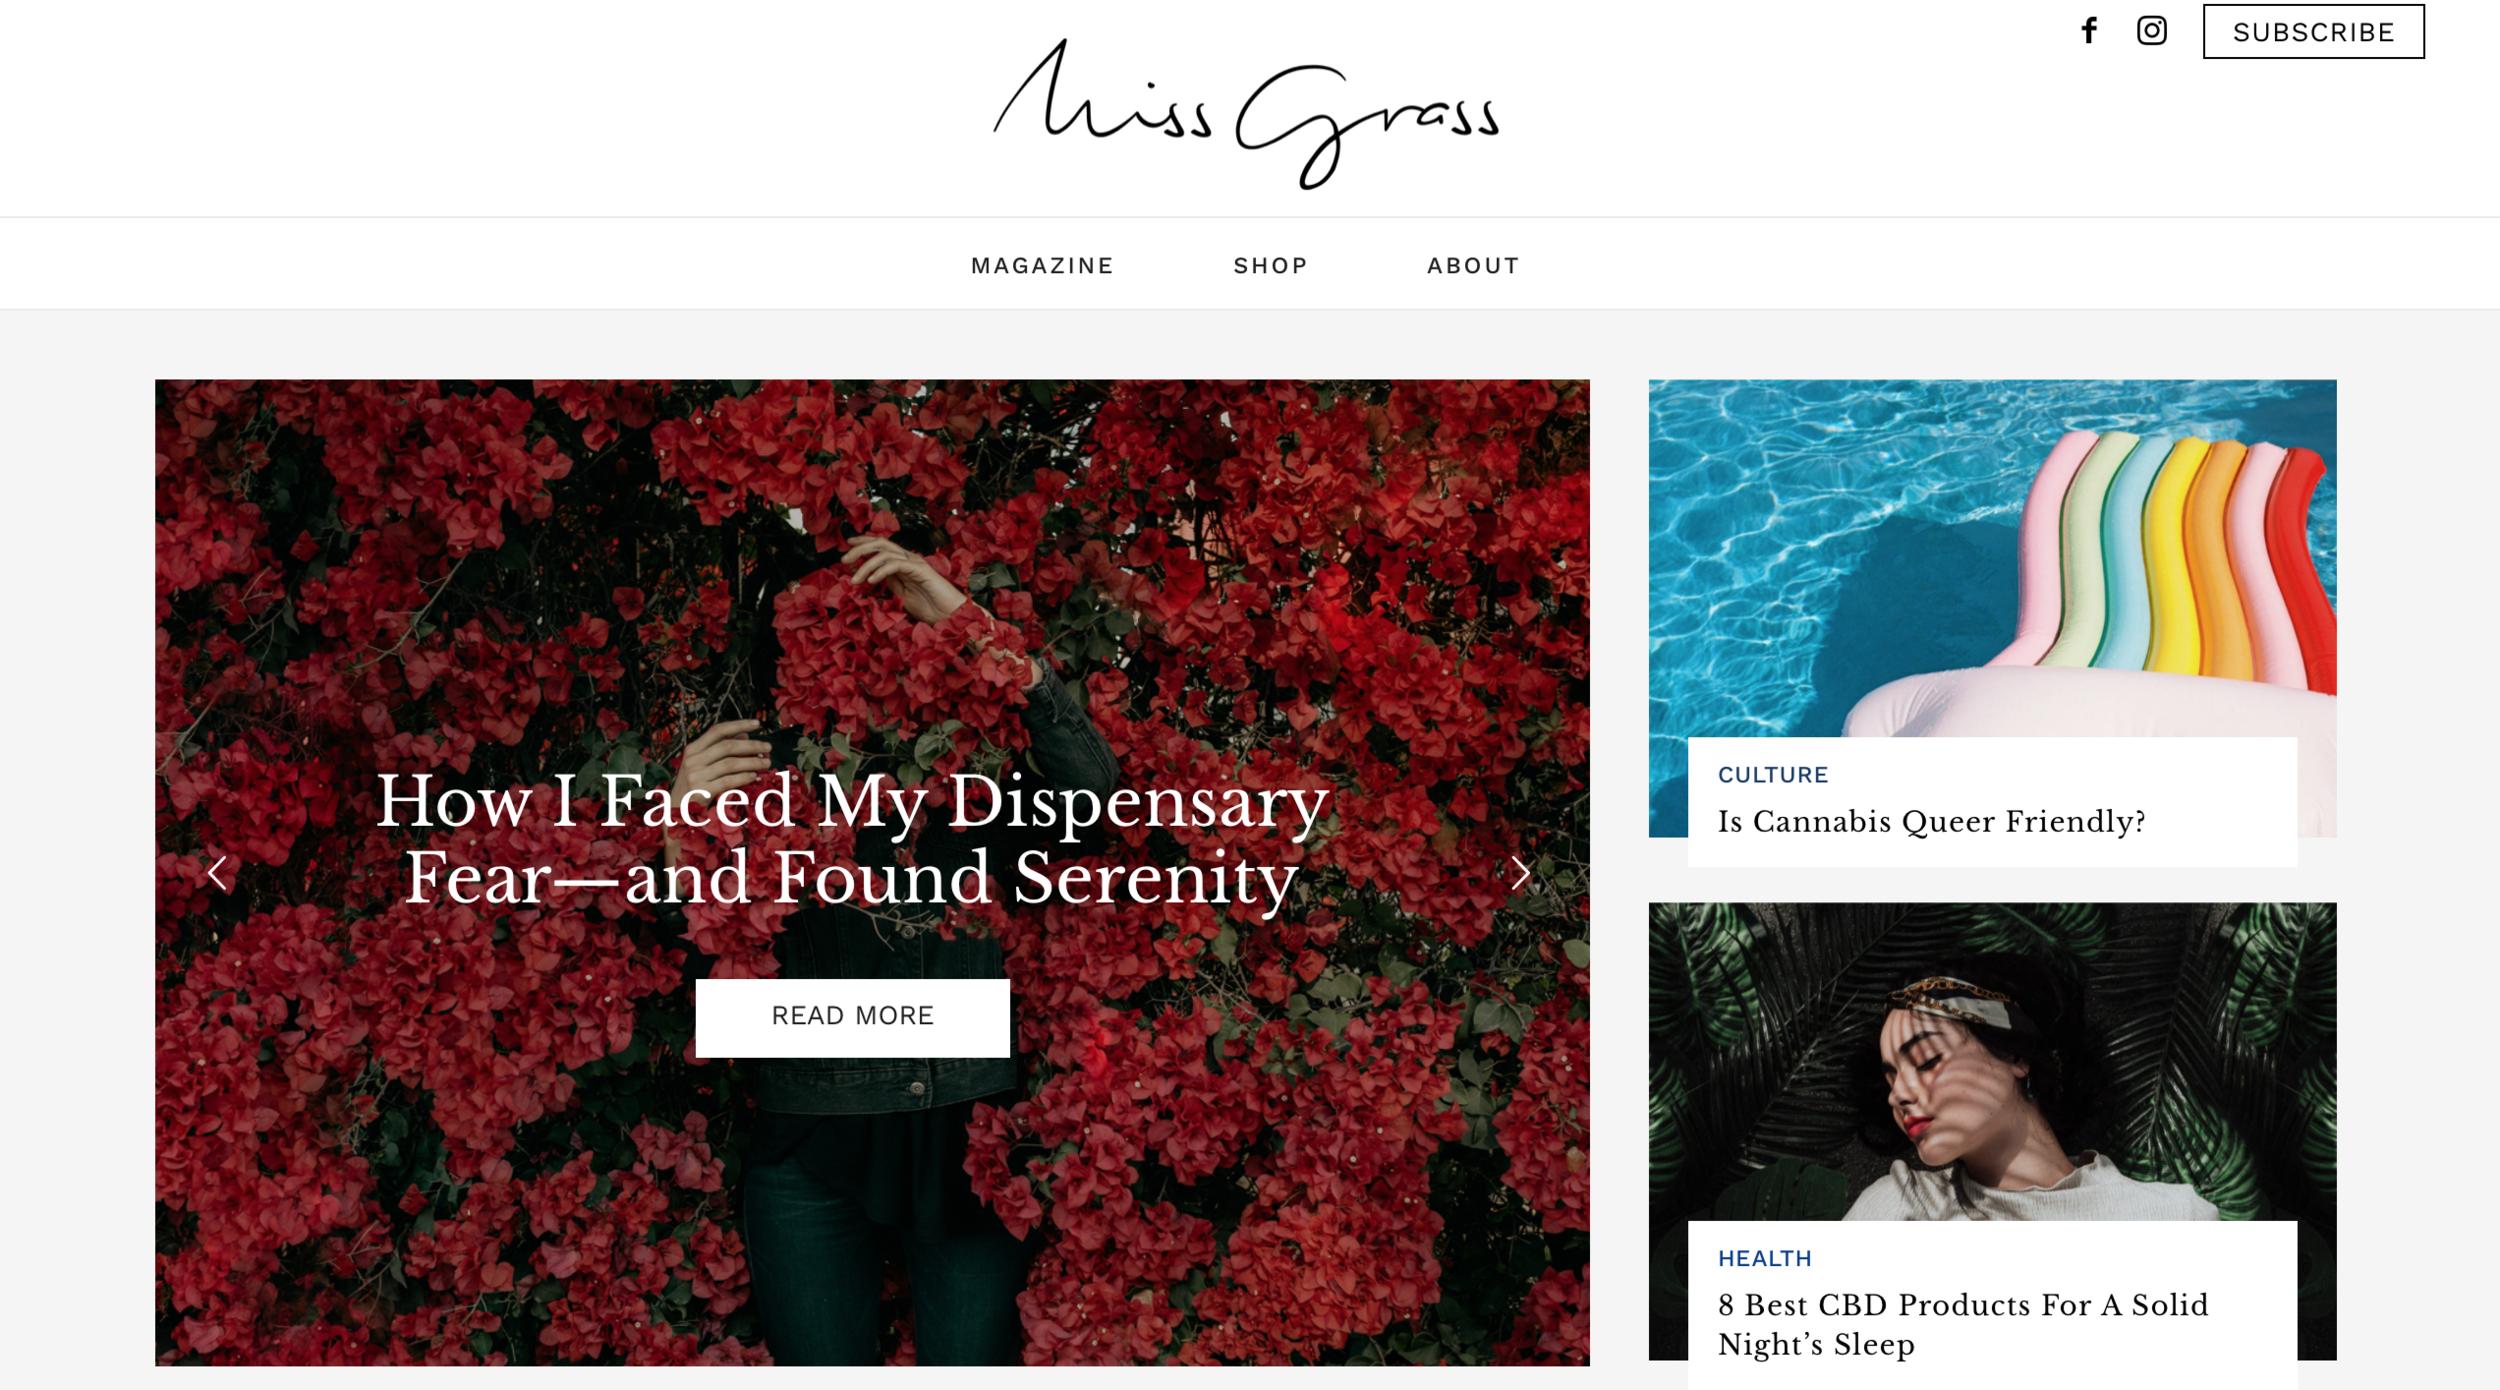 Good reads on the Miss Grass website